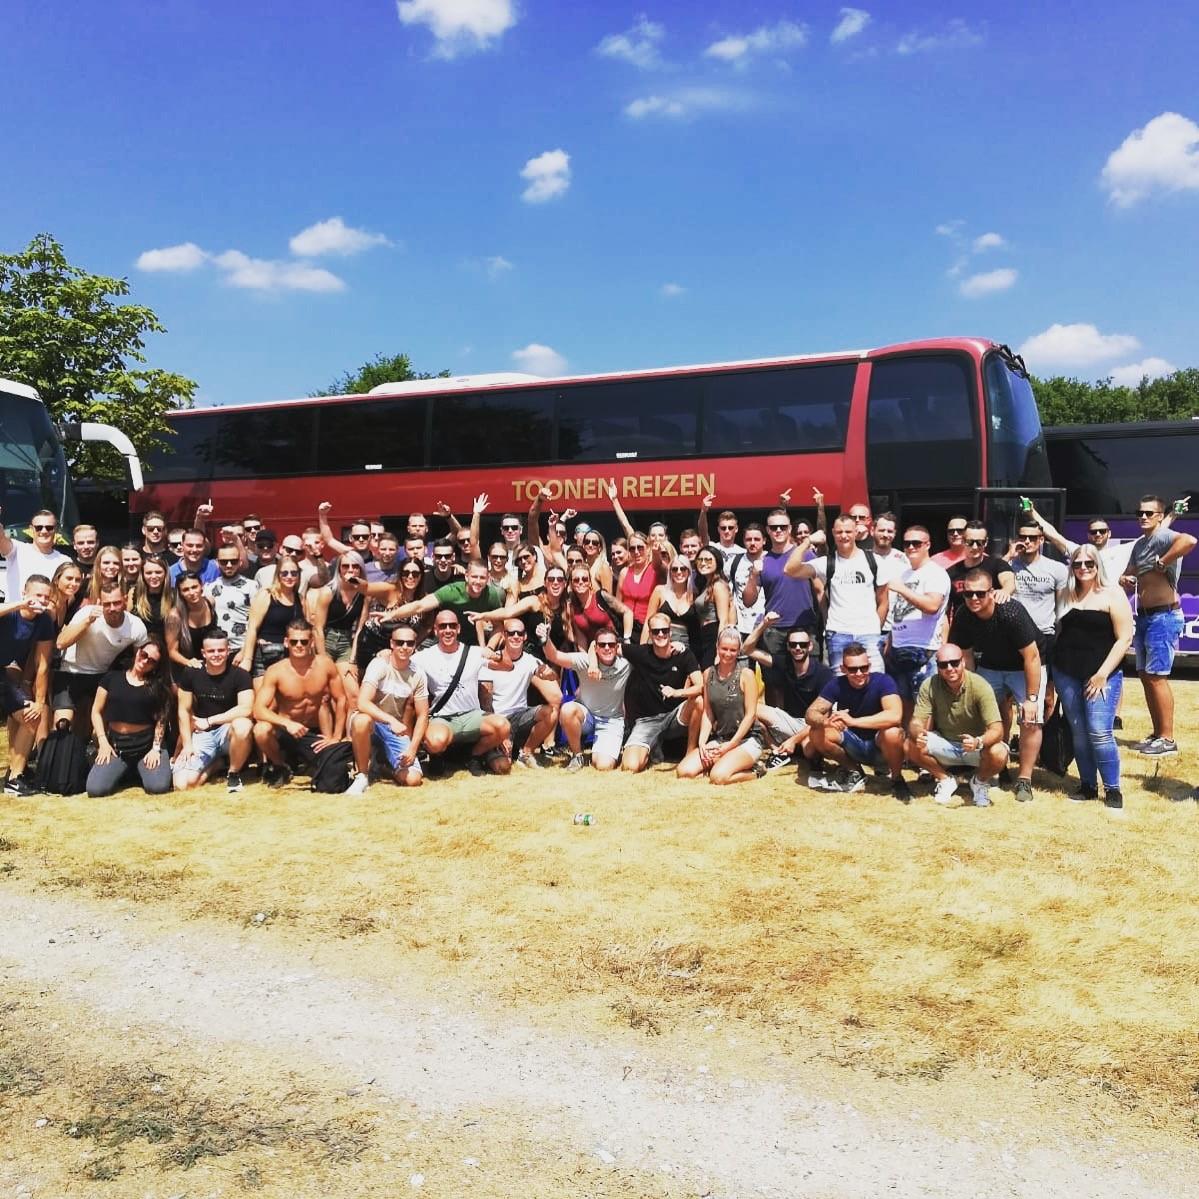 Festival-bus